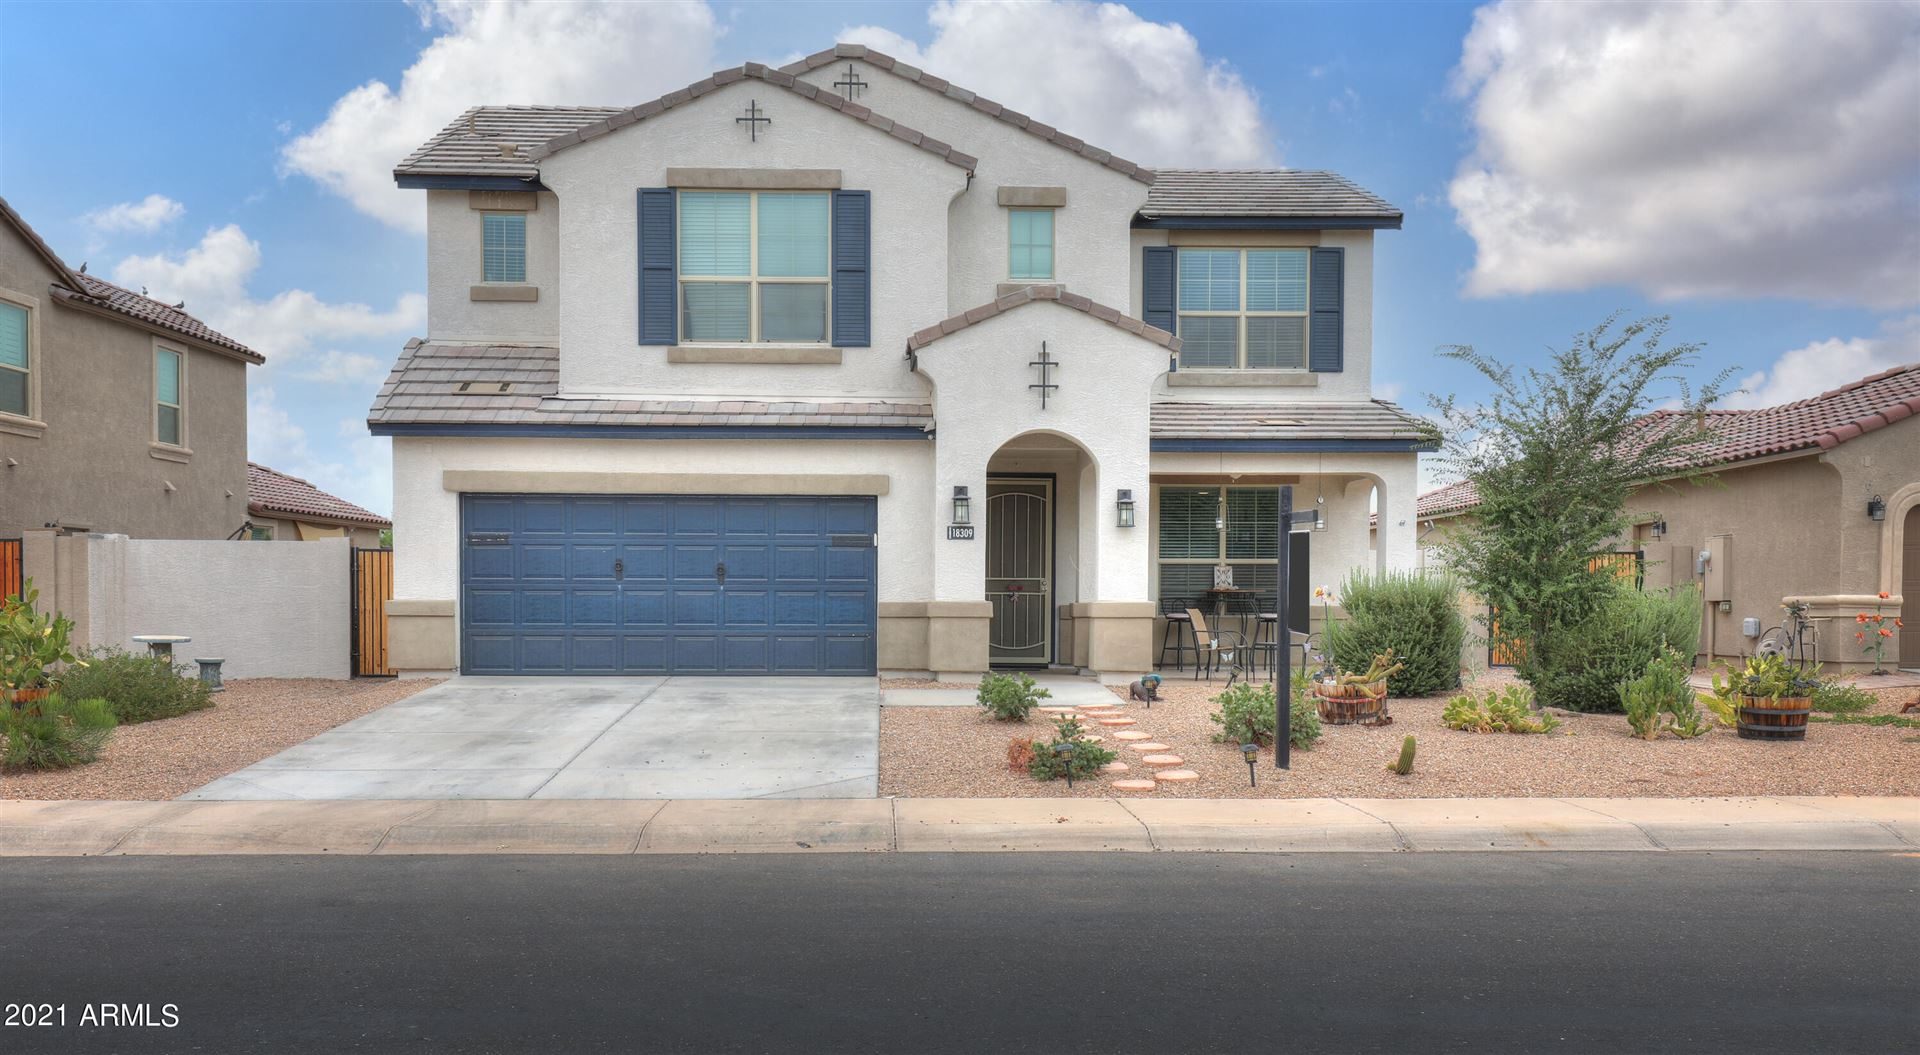 18309 N CRESTVIEW Lane, Maricopa, AZ 85138 - MLS#: 6259375